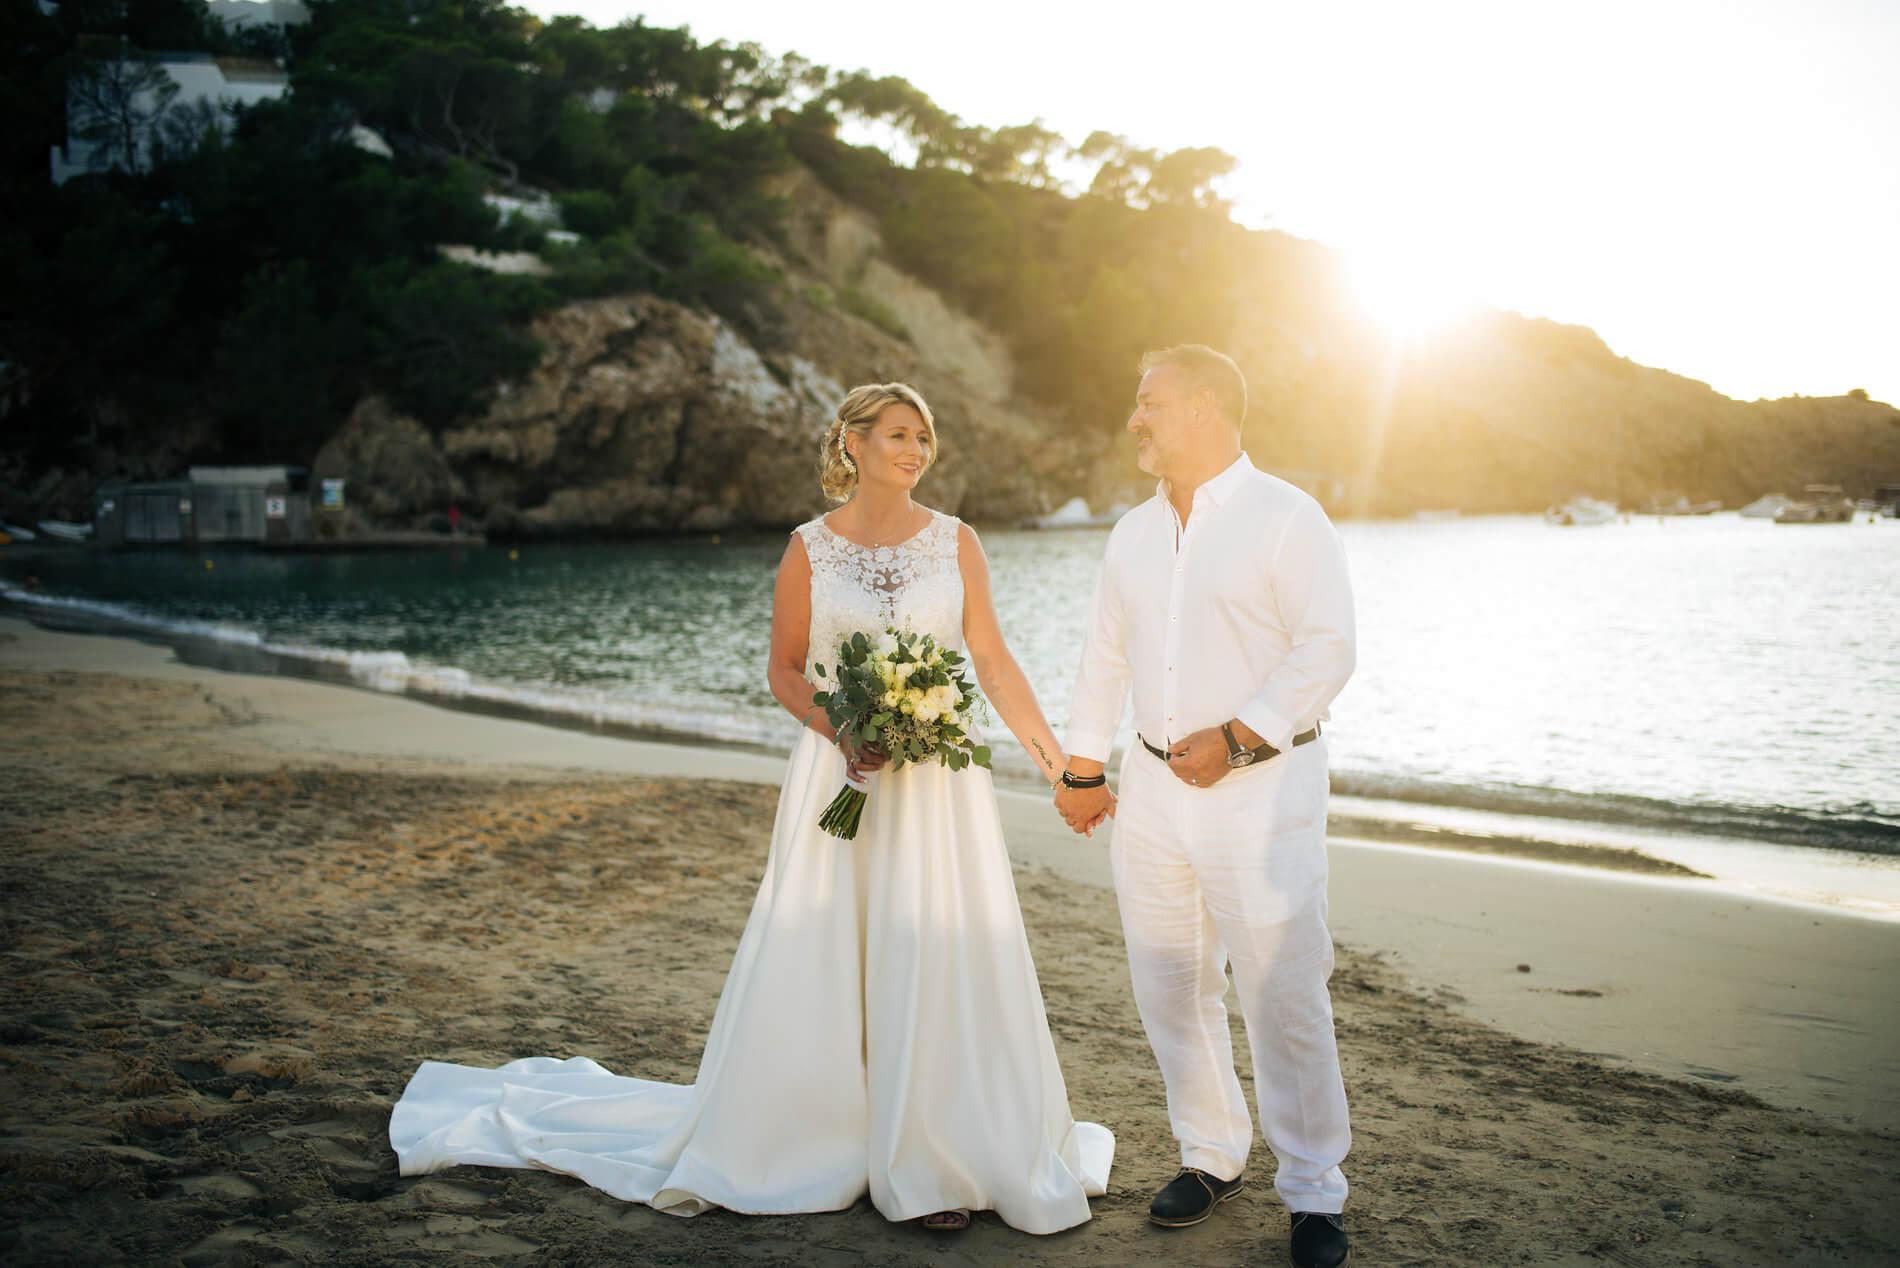 https://www.white-ibiza.com/wp-content/uploads/2020/03/ibiza-wedding-venue-maya-beach-club-2020-07.jpg